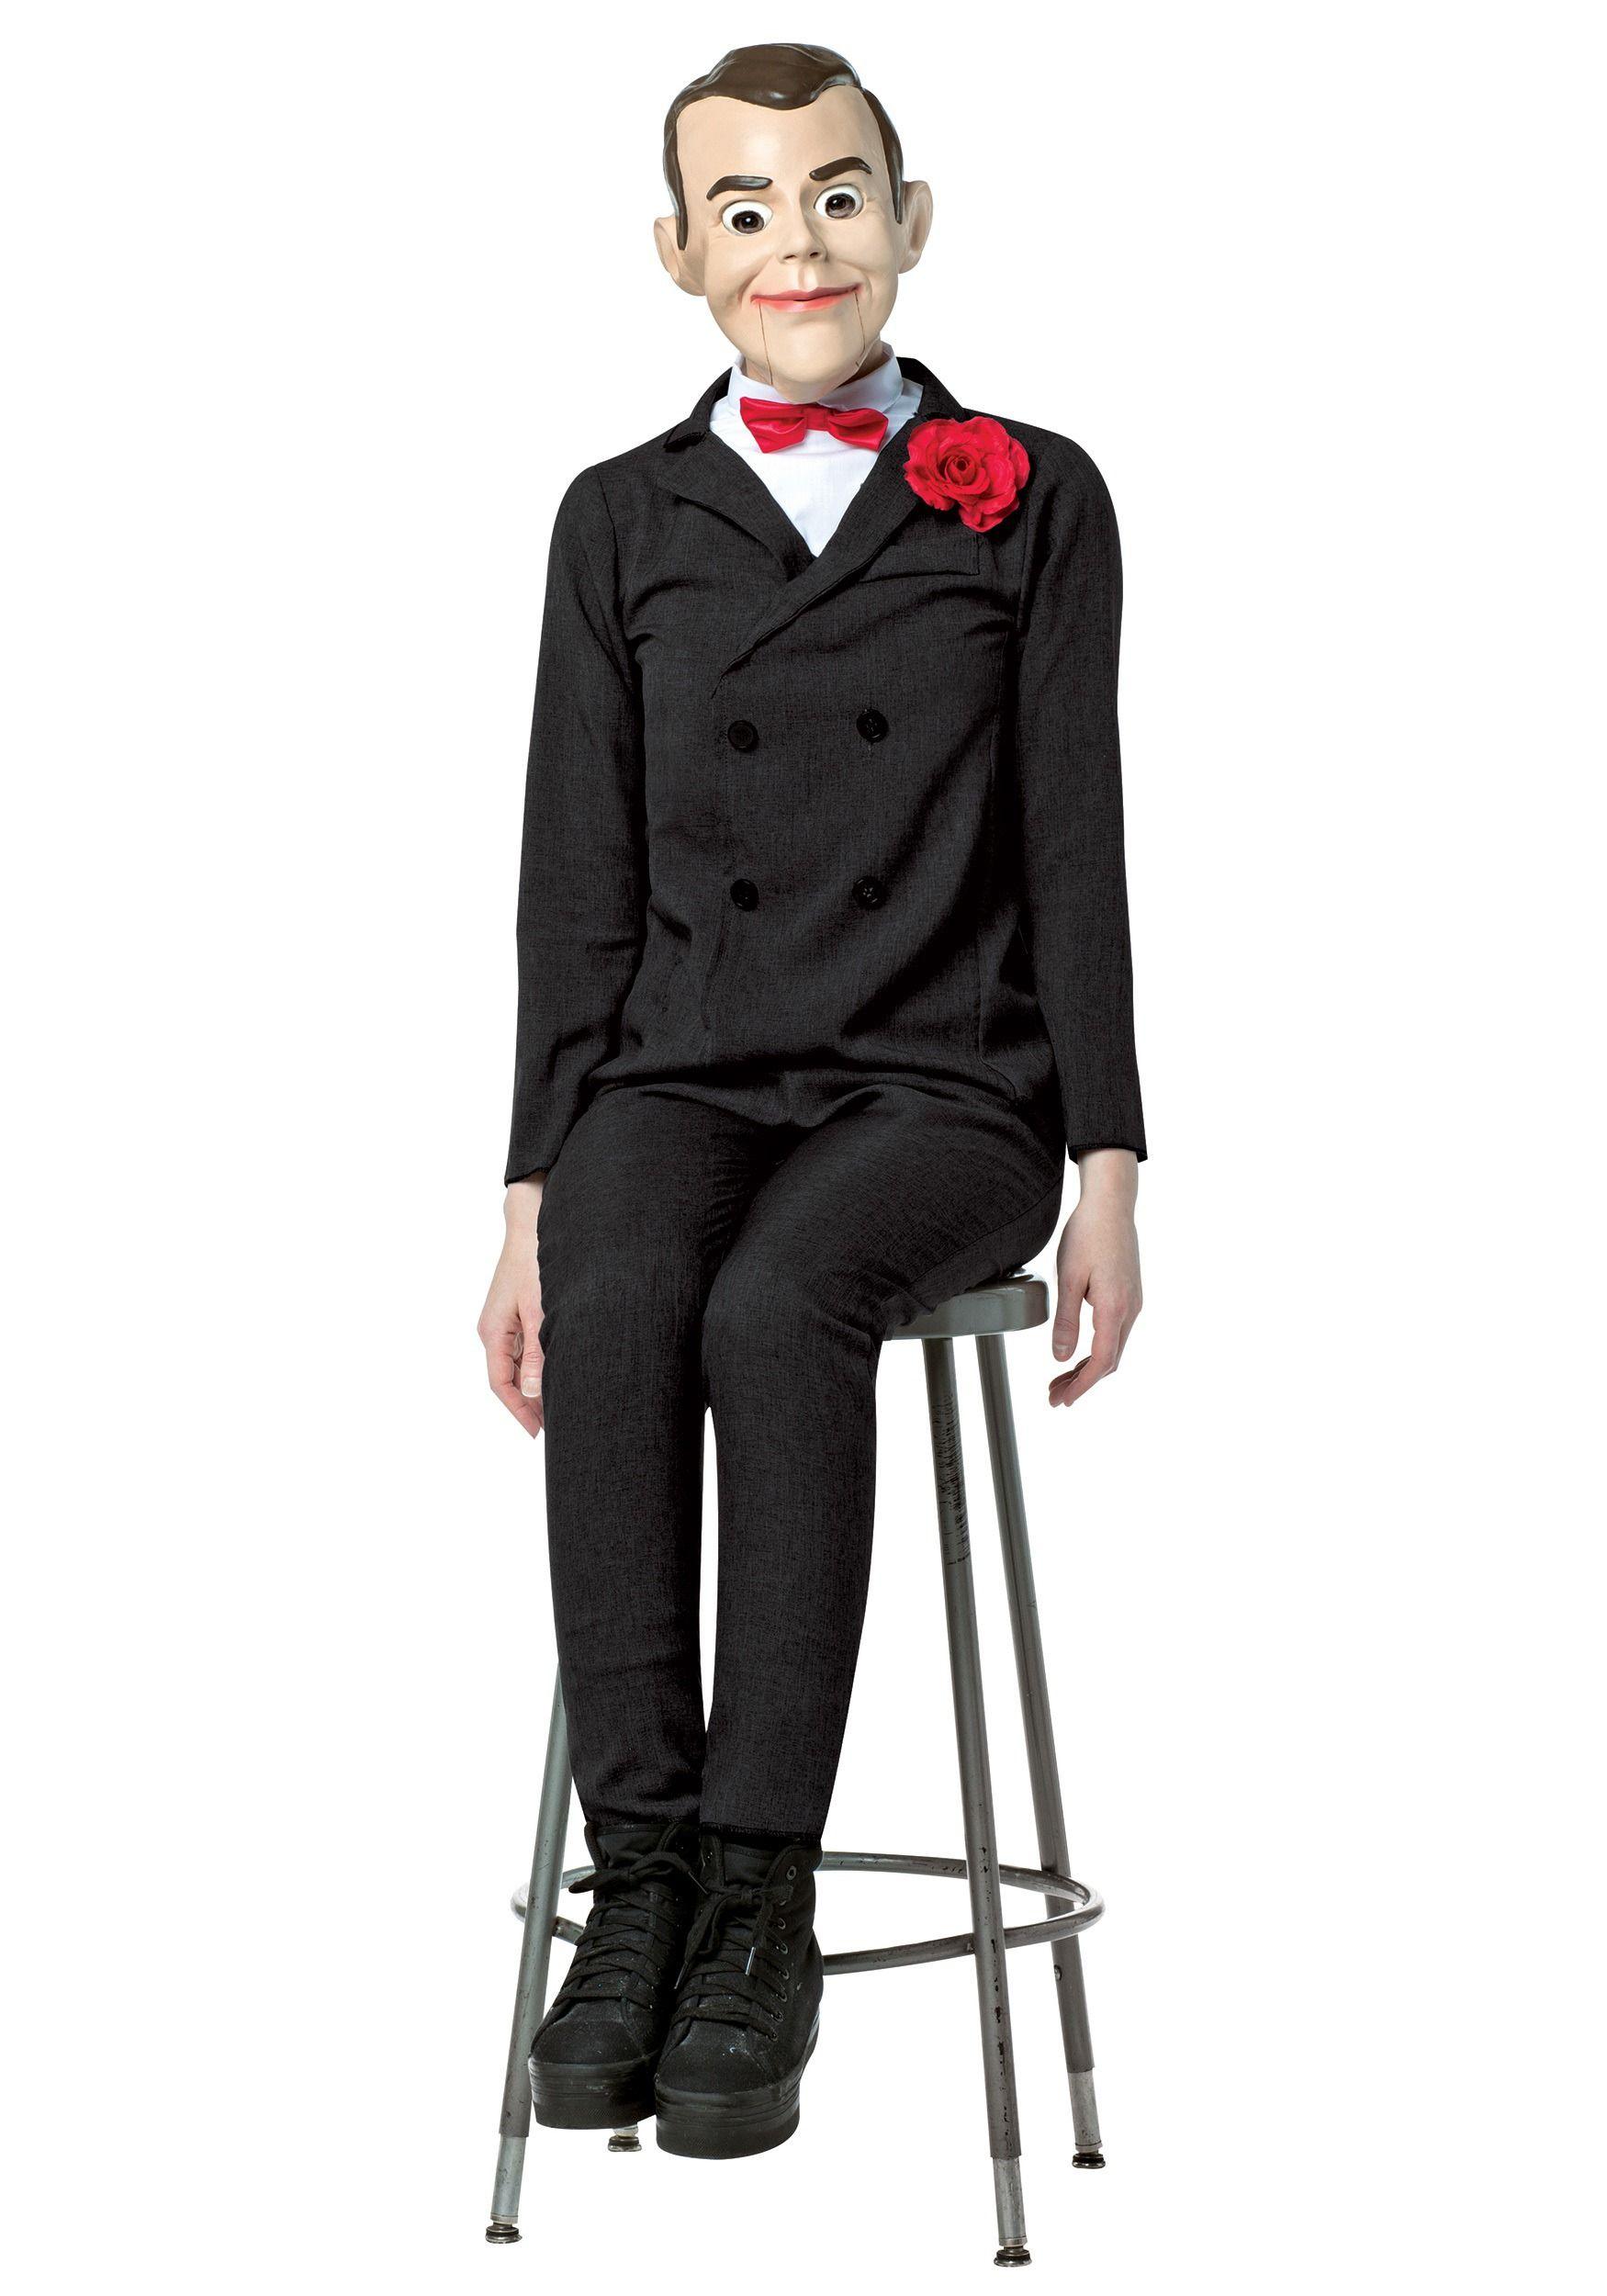 Boys Goosebumps Slappy Costume | Book character ideas | Pinterest ...